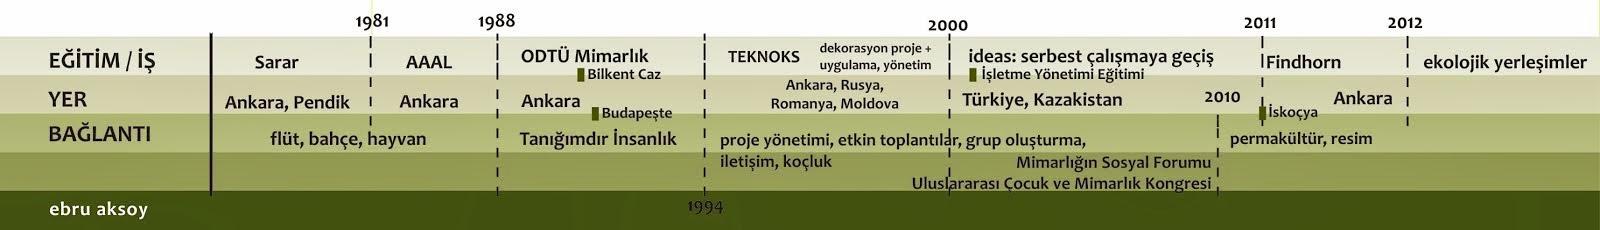 Ebru Aksoy timeline